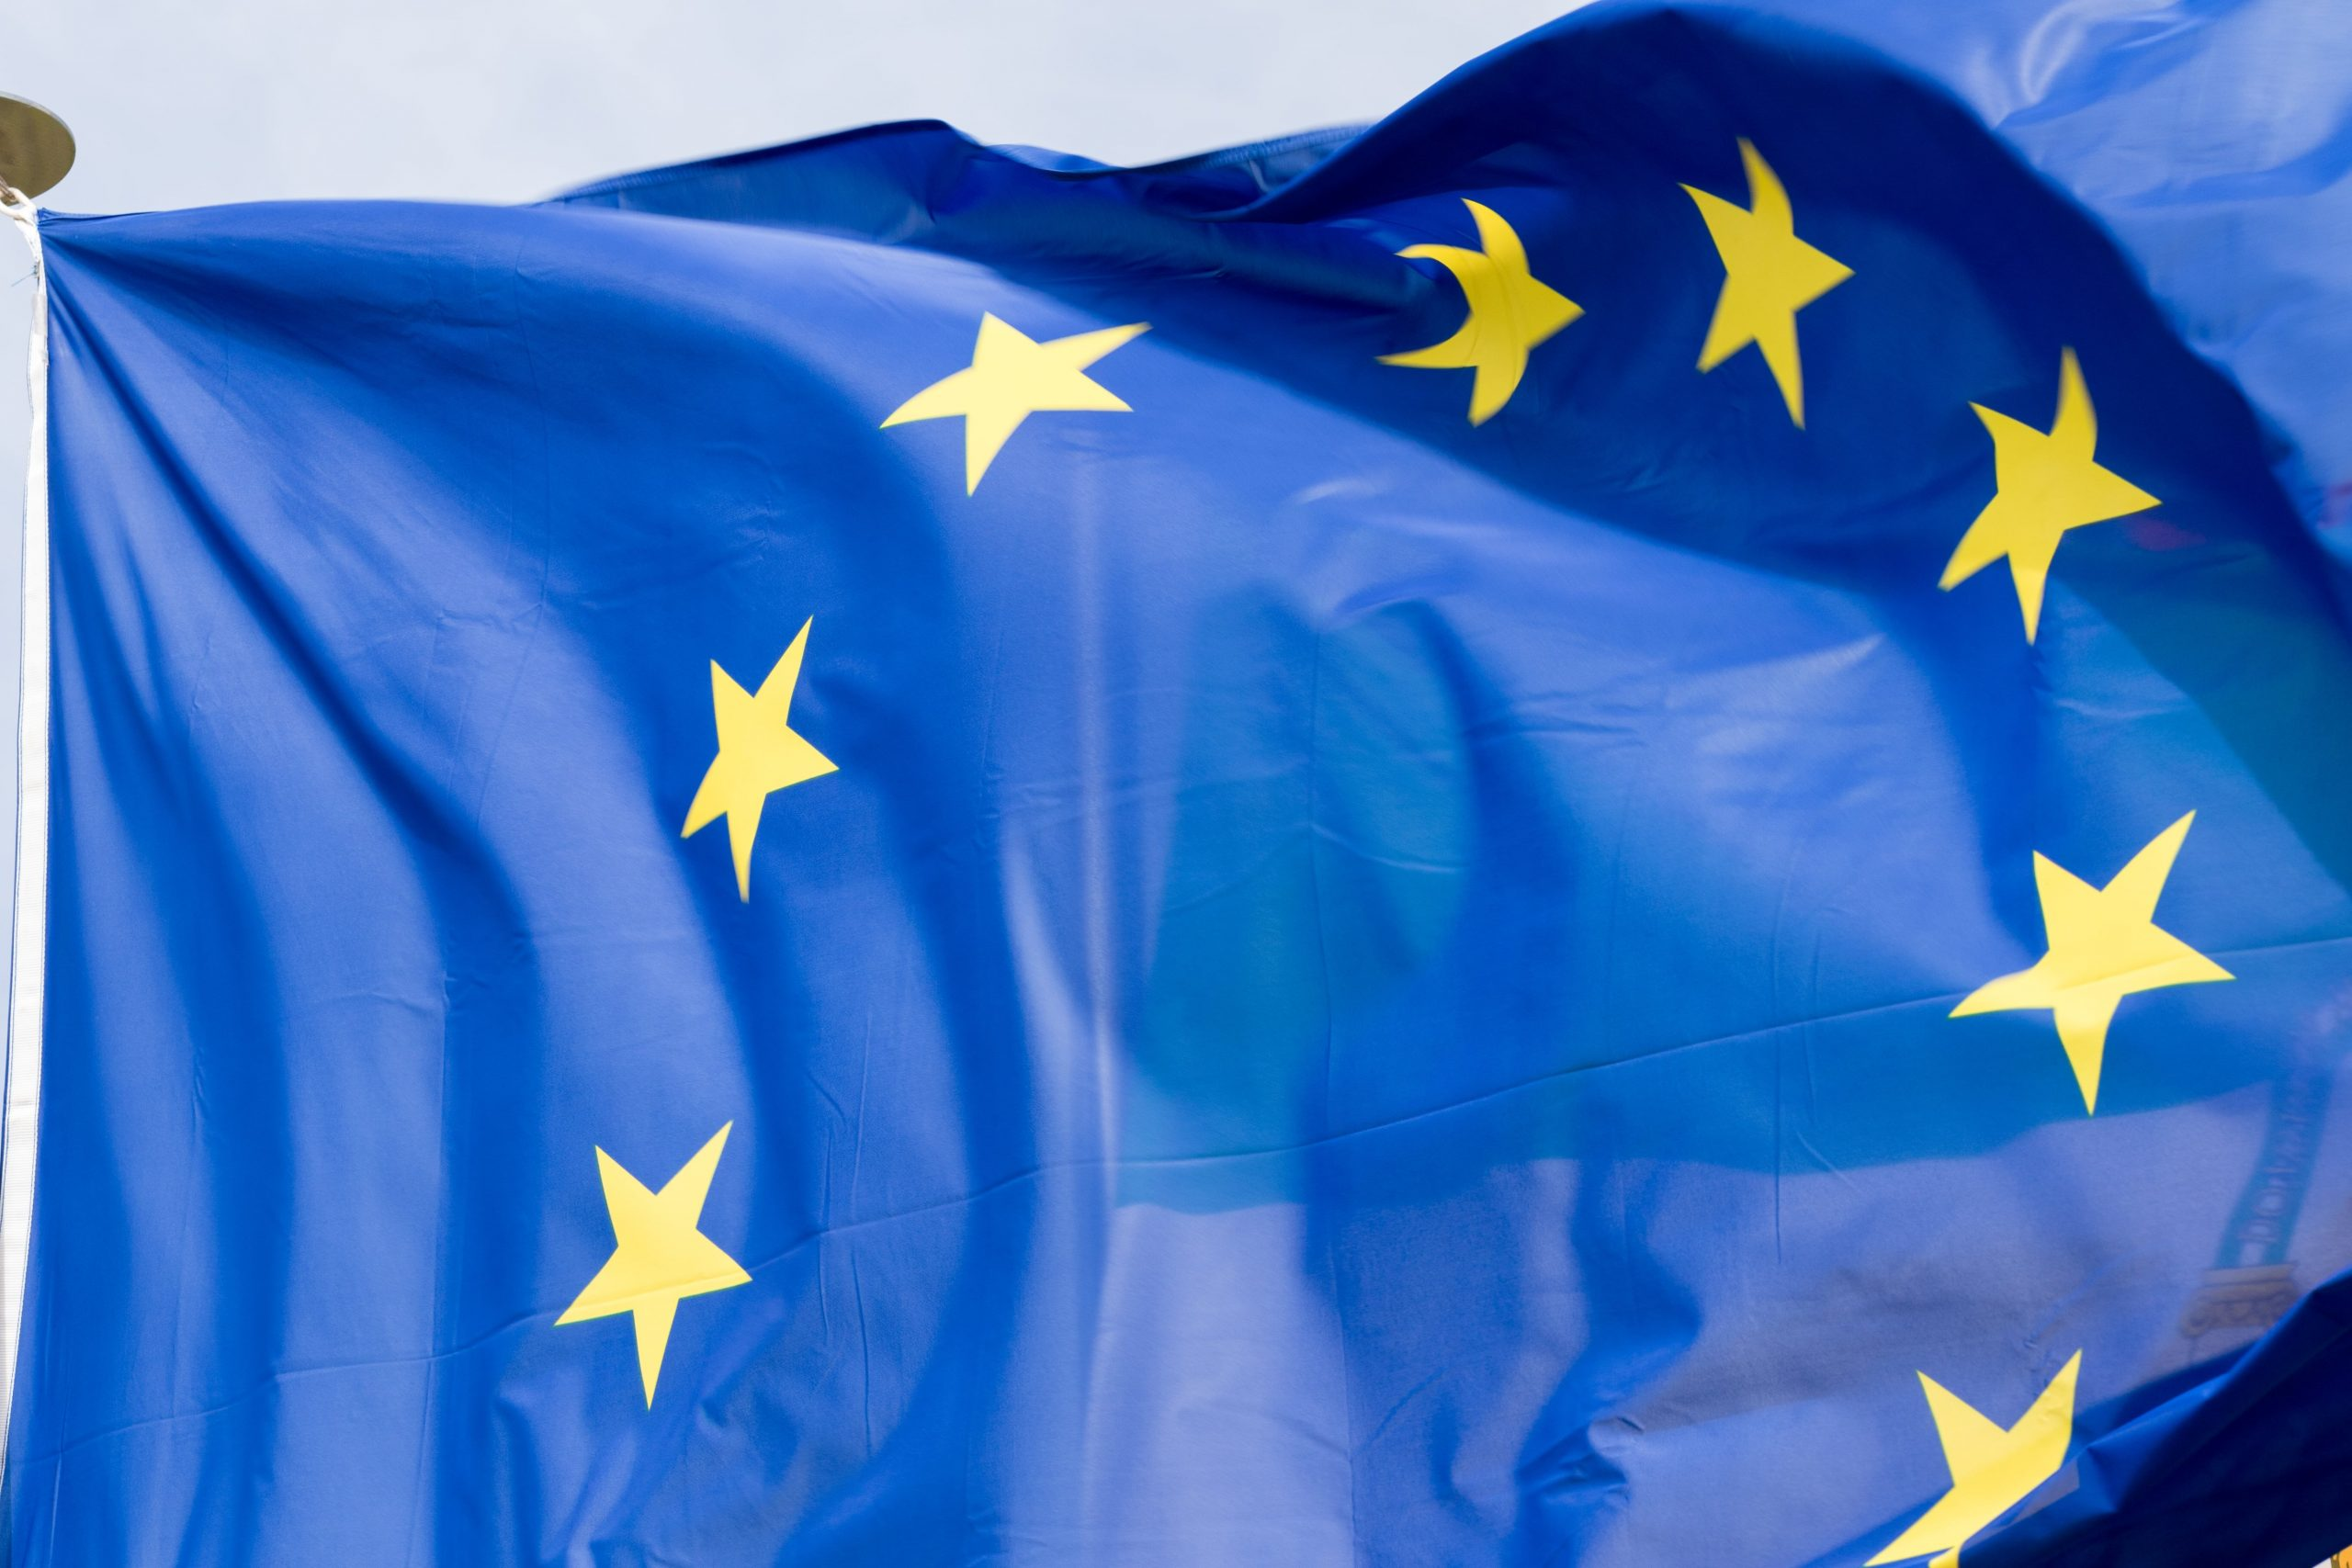 milan-italy-april-24-2018-flag-of-the-european-com-N7Y5AS6-min